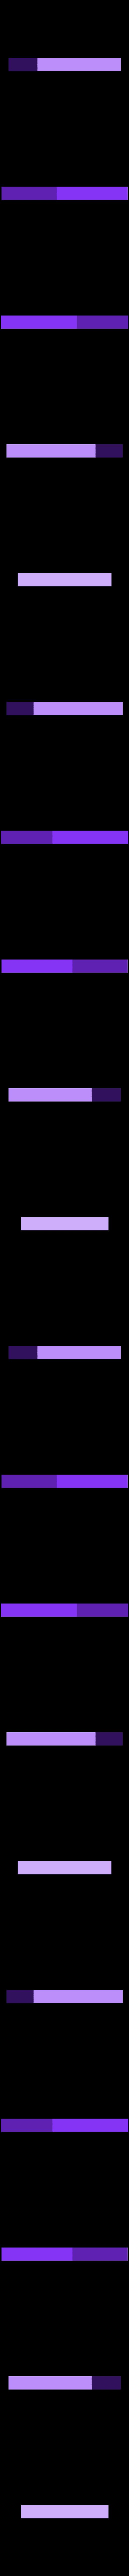 Raspberry_Pi_3B%2B_Sleeve.Raspberry_Pi_3B..Body4.stl Télécharger fichier STL gratuit Raspberry Pi 3B+ Sleeve • Design à imprimer en 3D, Wilko